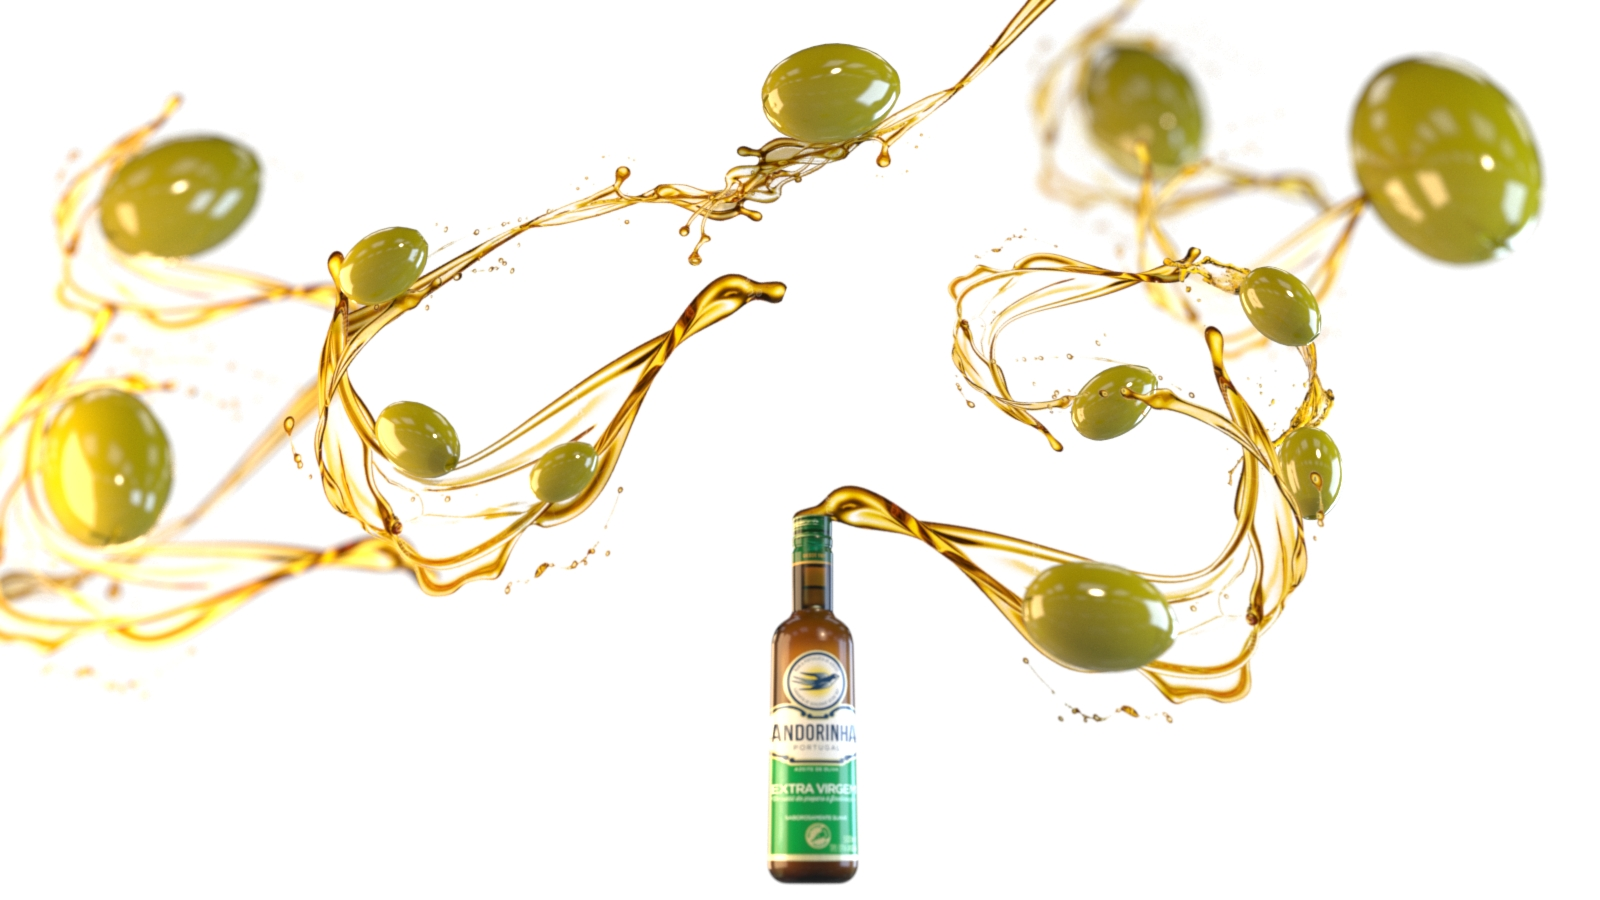 Andorinha Olive